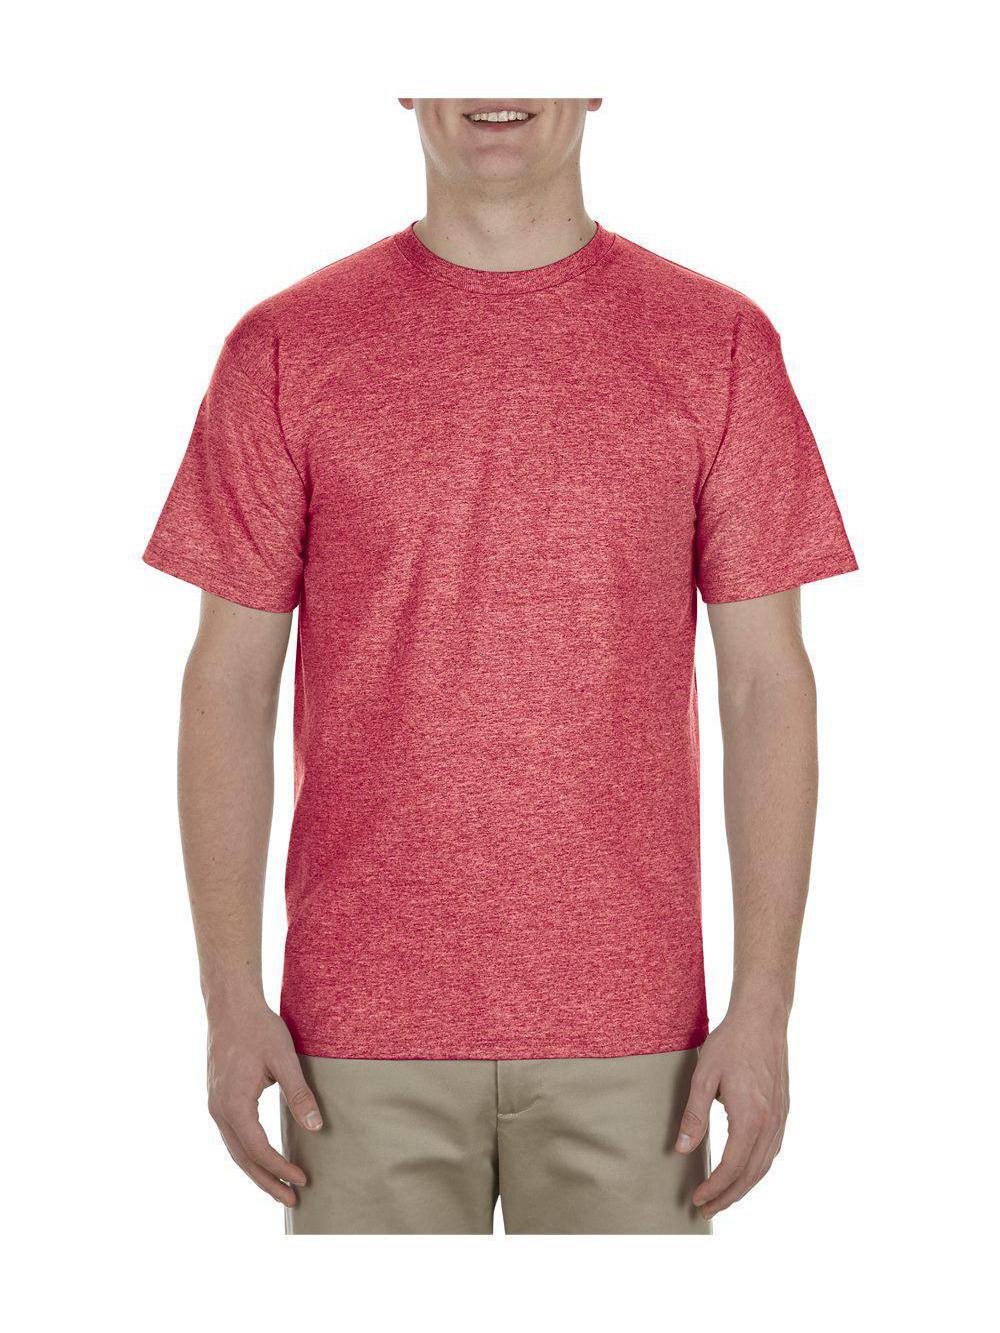 ALSTYLE-Premium-T-Shirt-1701 thumbnail 46